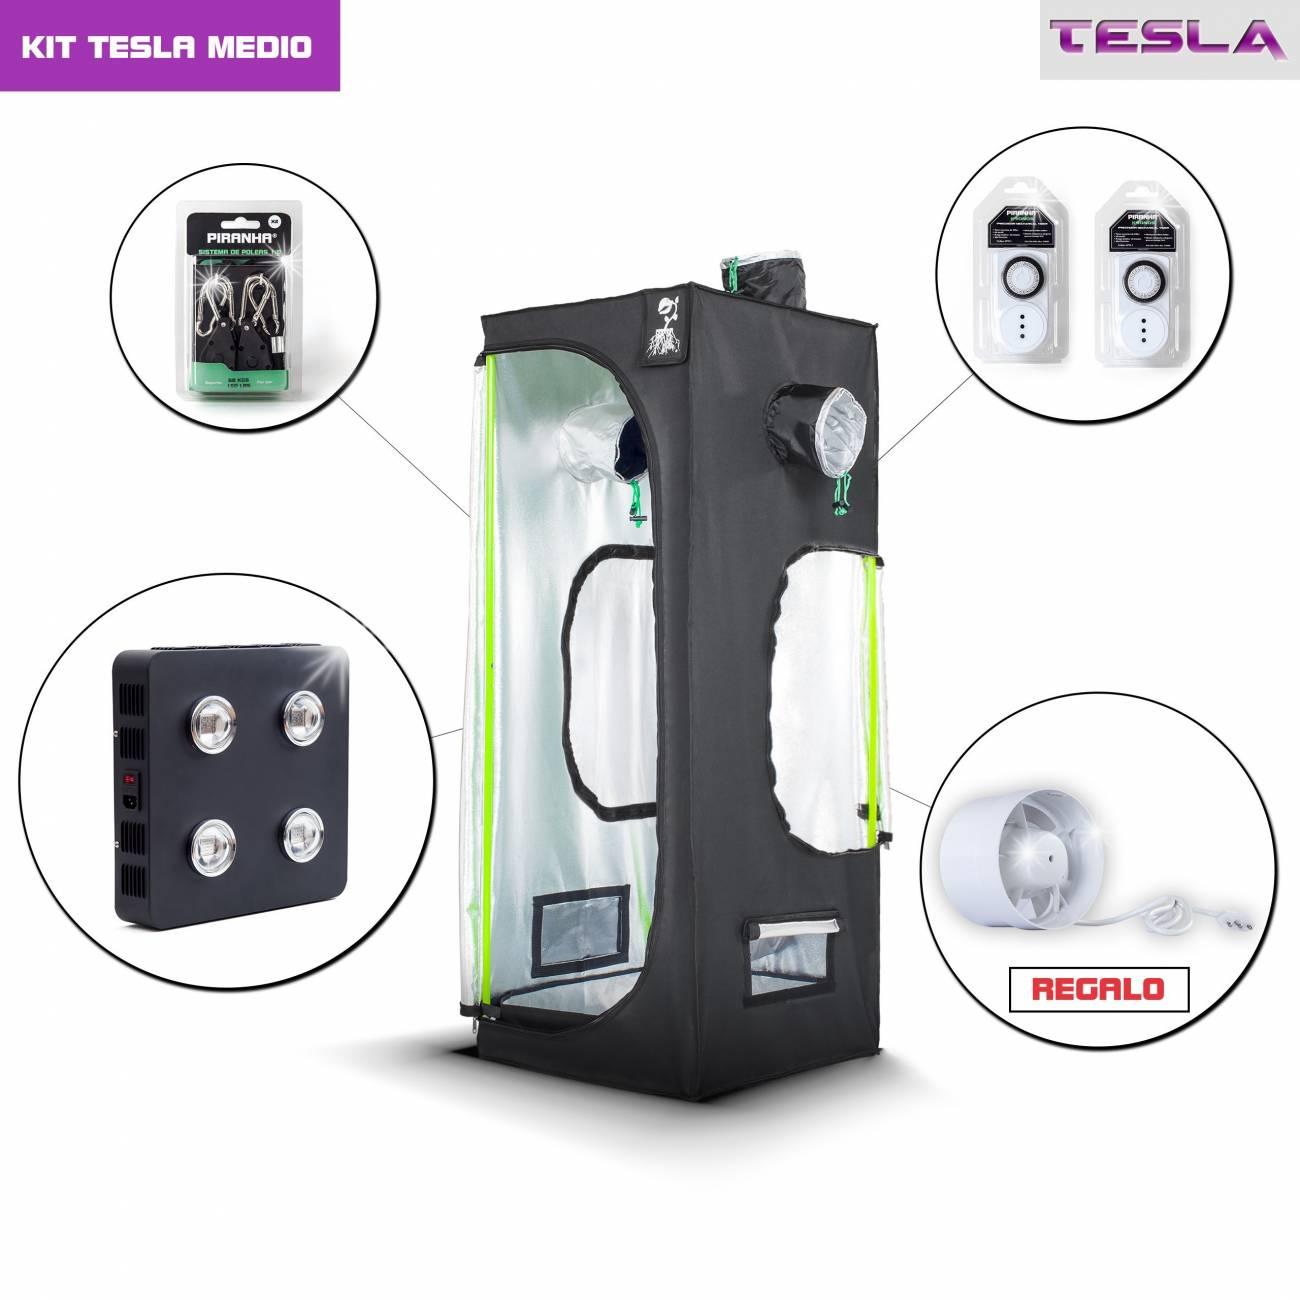 Kit Tesla 60 - T360W Medio